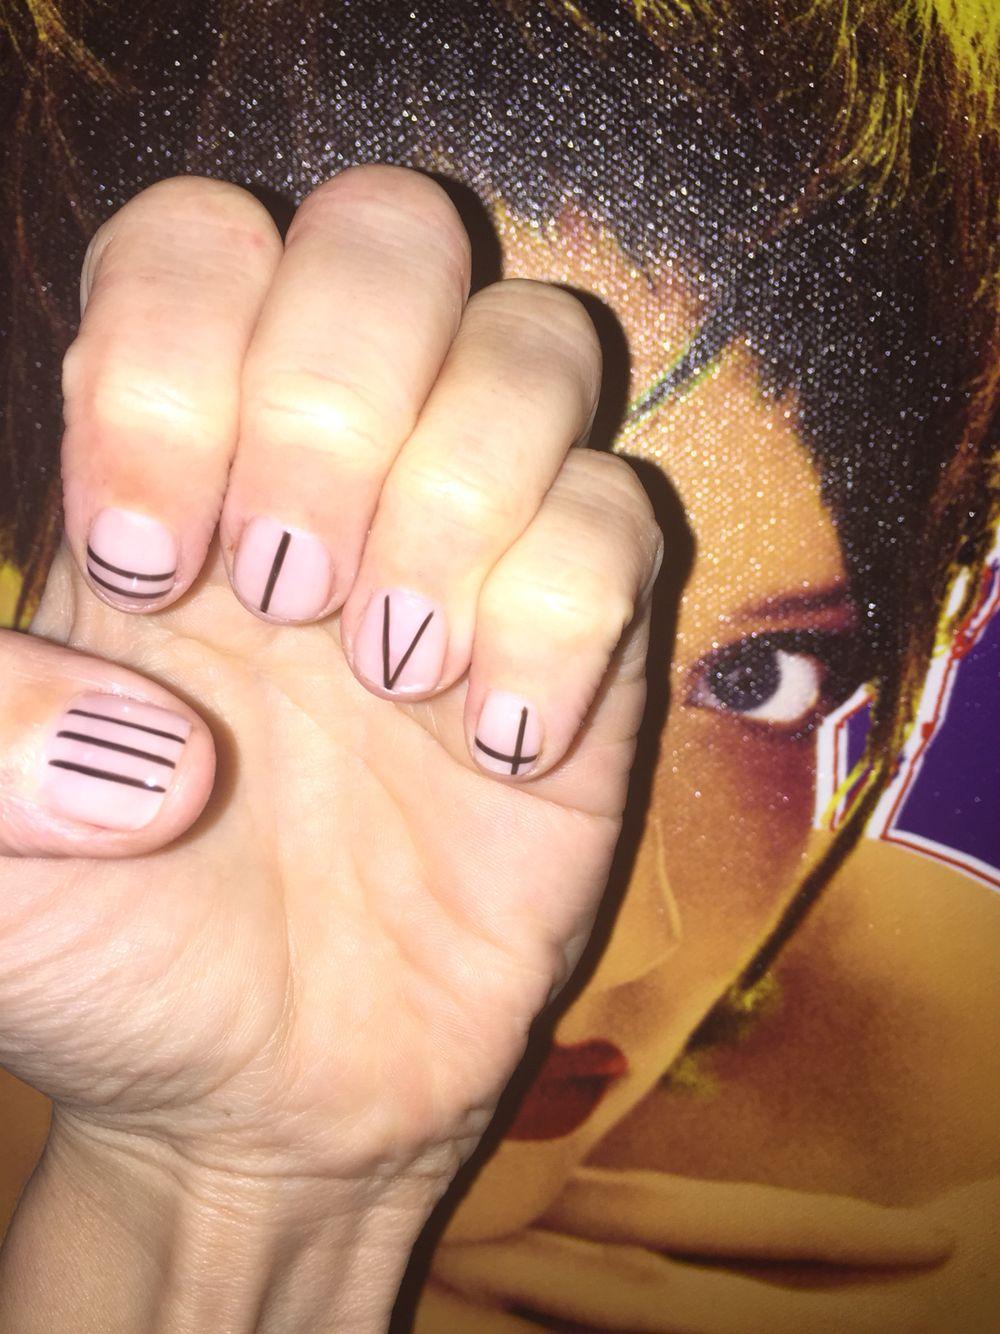 Nail art by Jennifer @heavenlynails in San Diego | pINTERESTING ...